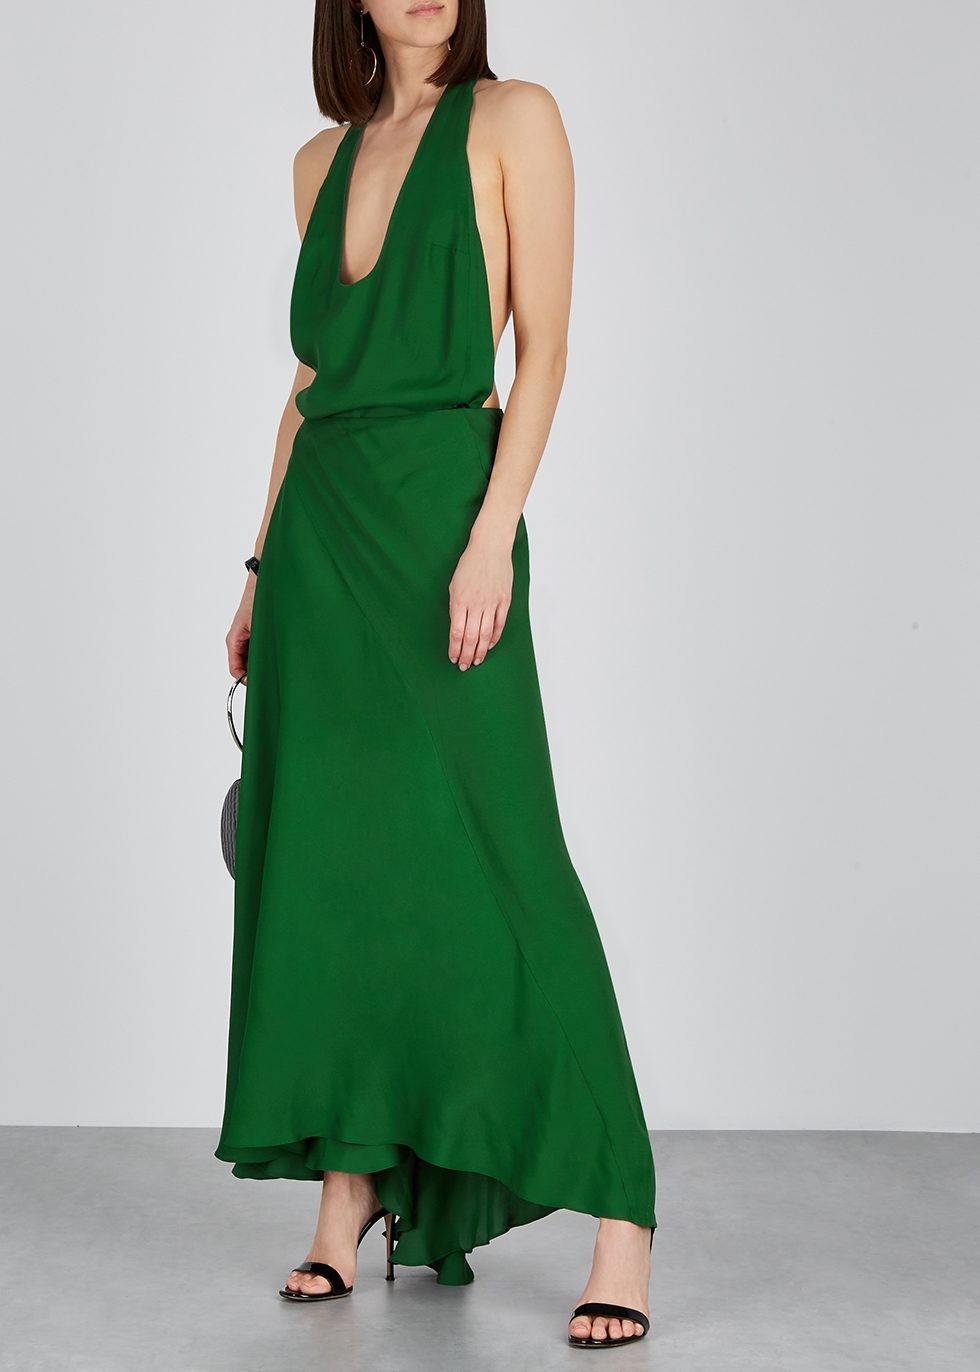 Green halterneck maxi dress - Haider Ackermann